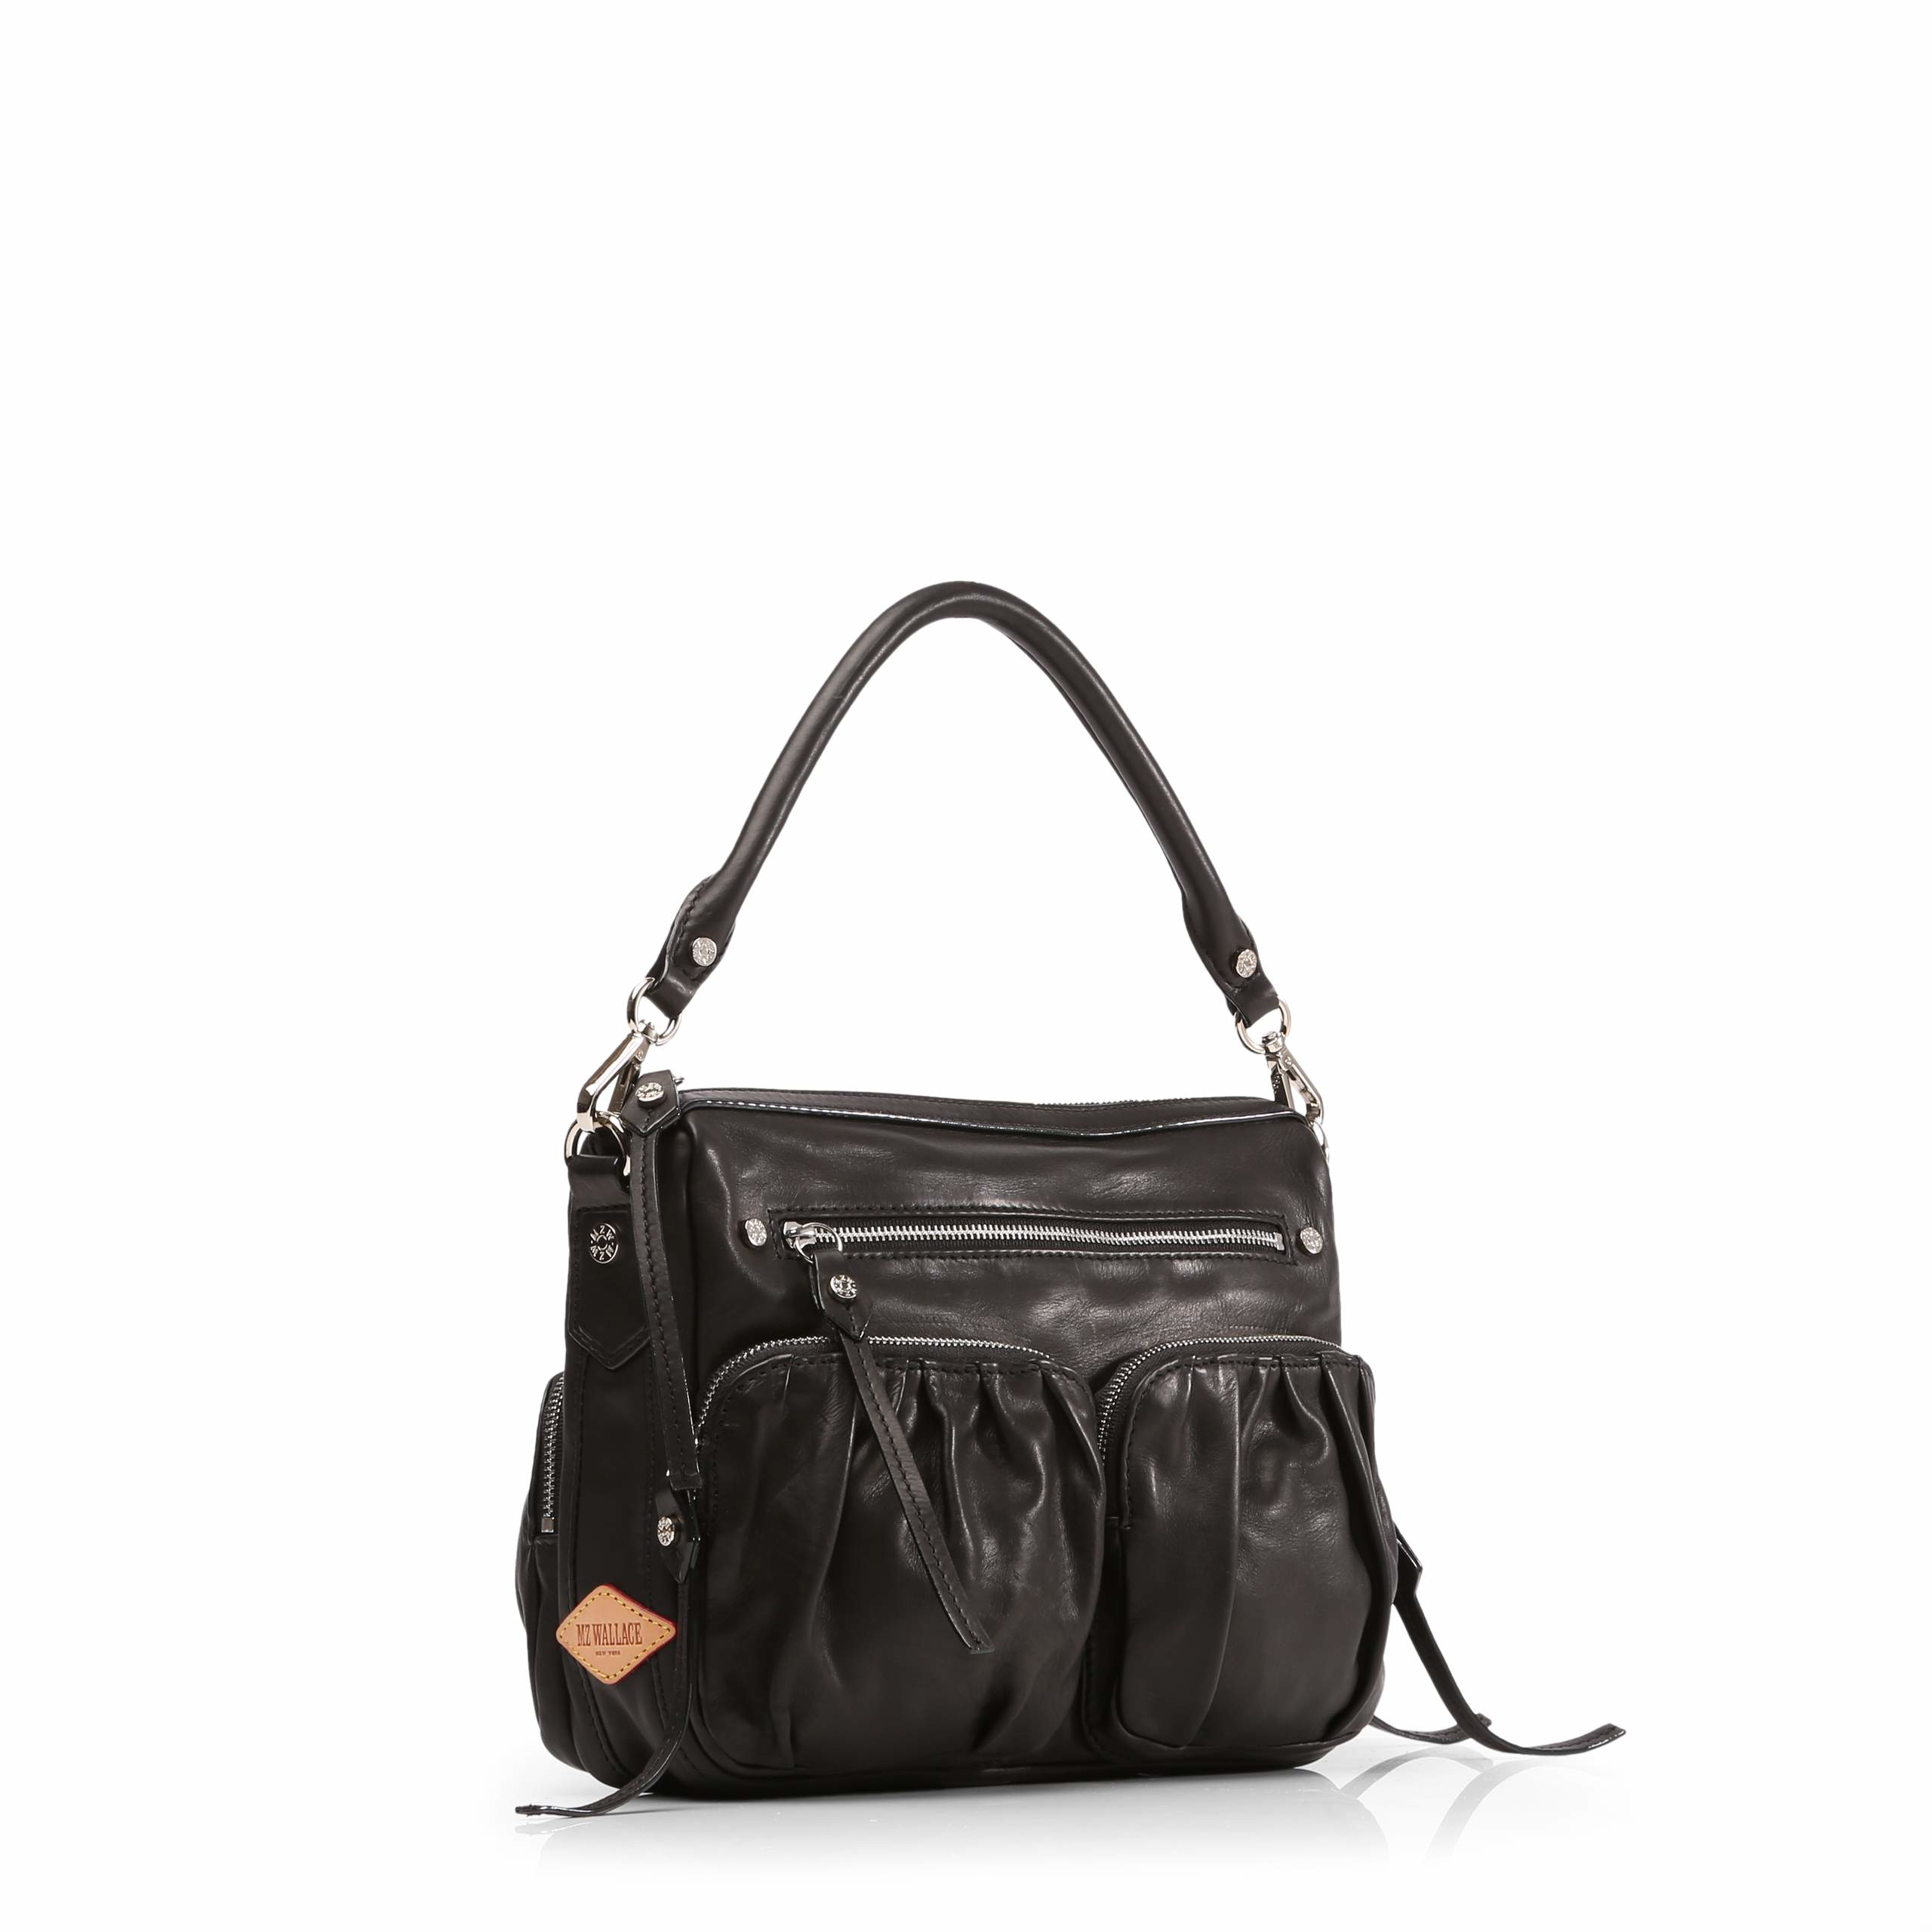 mz wallace handbags. Gallery Mz Wallace Handbags